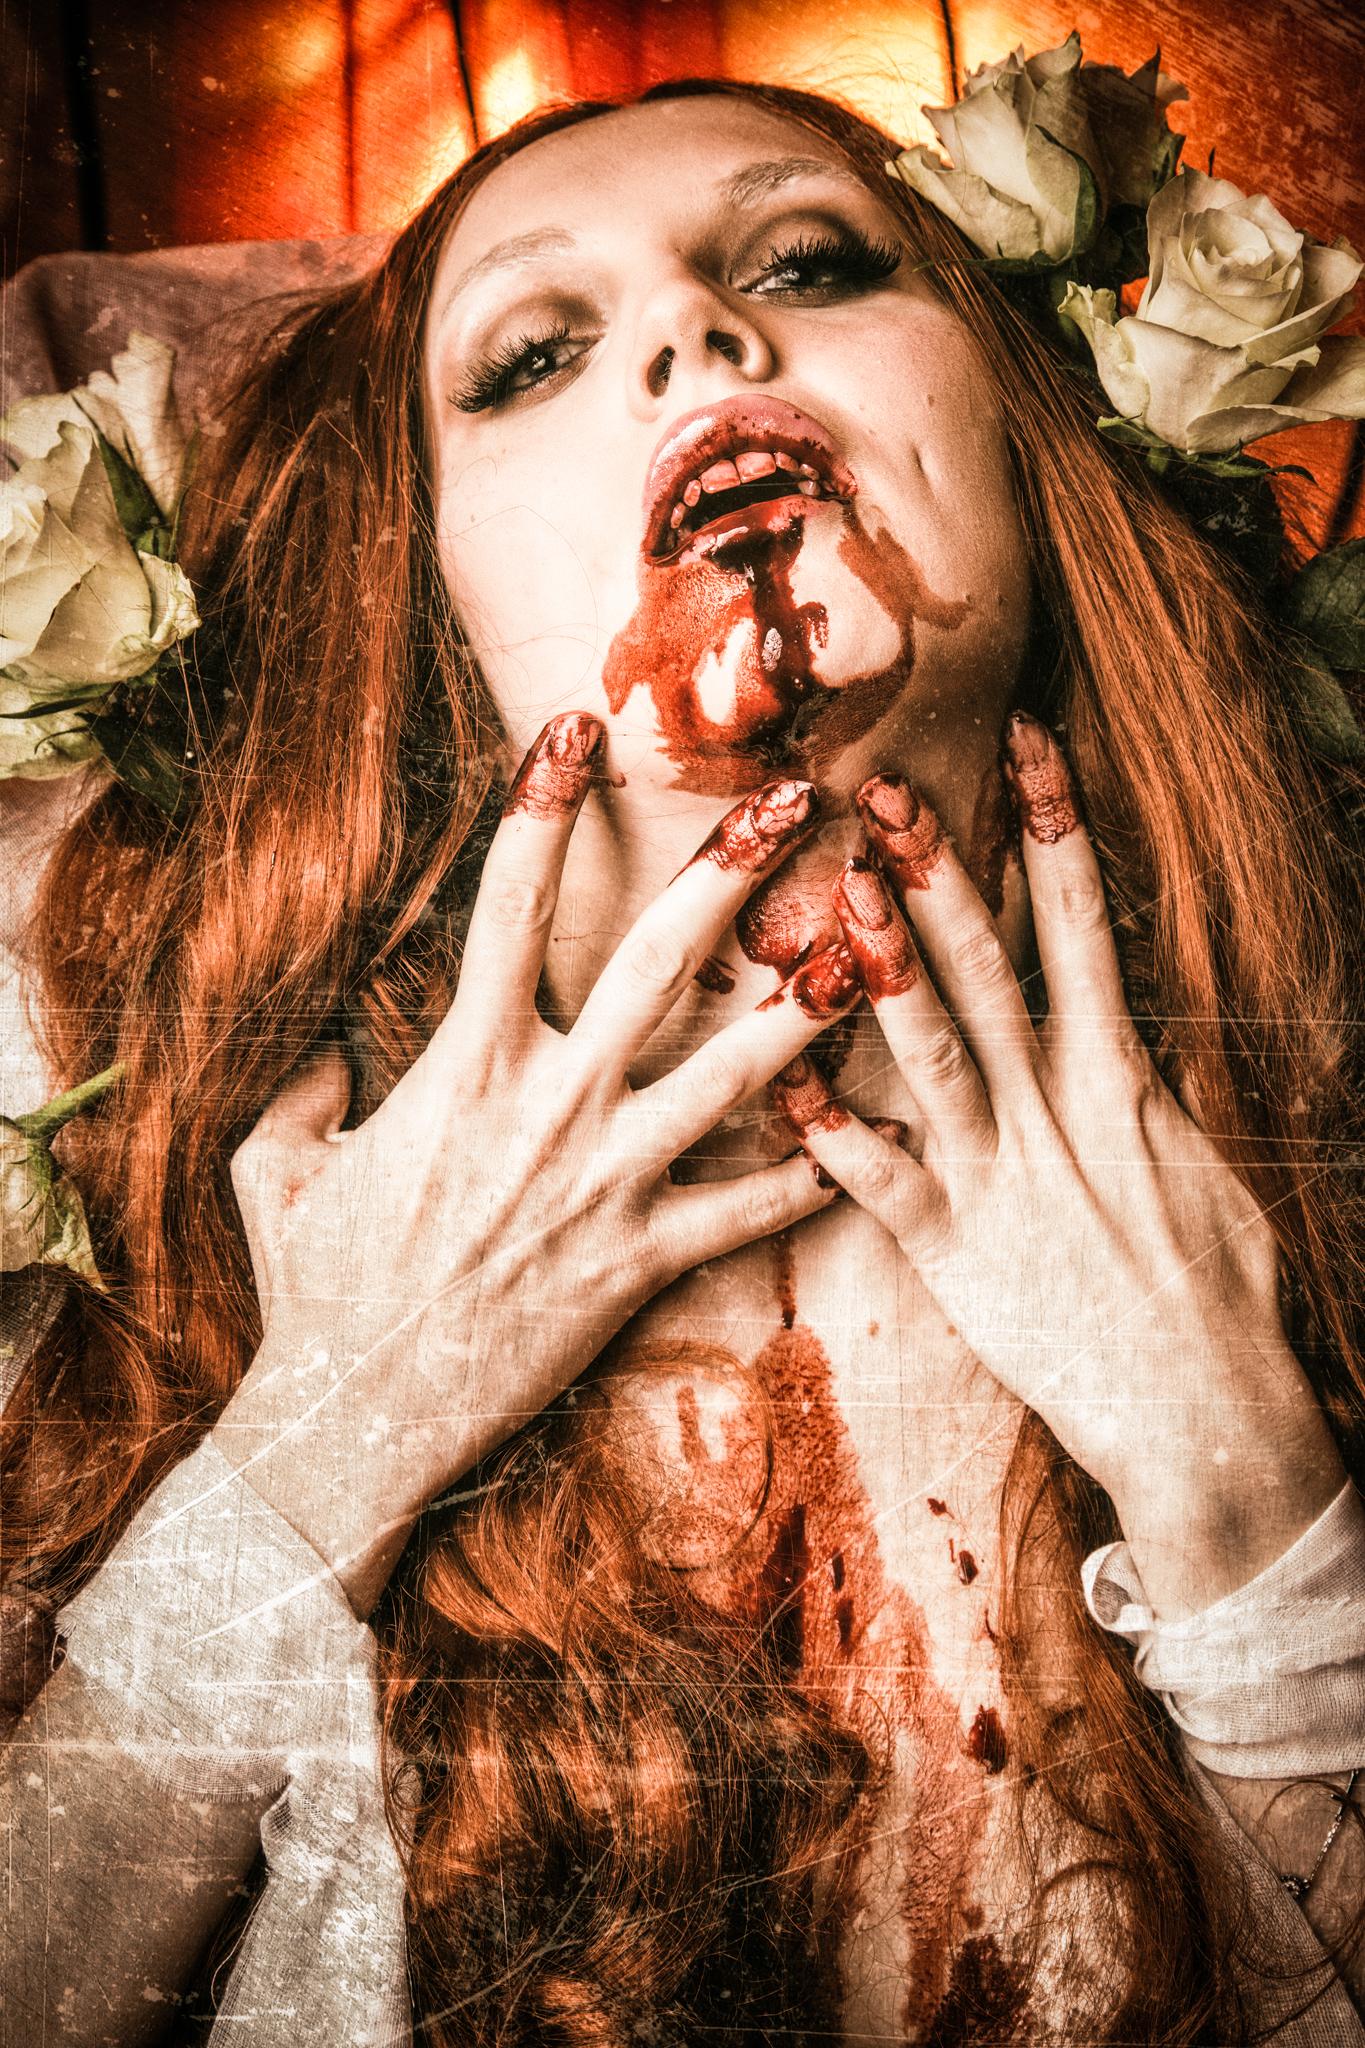 ThornsThorns - Halloween 2018